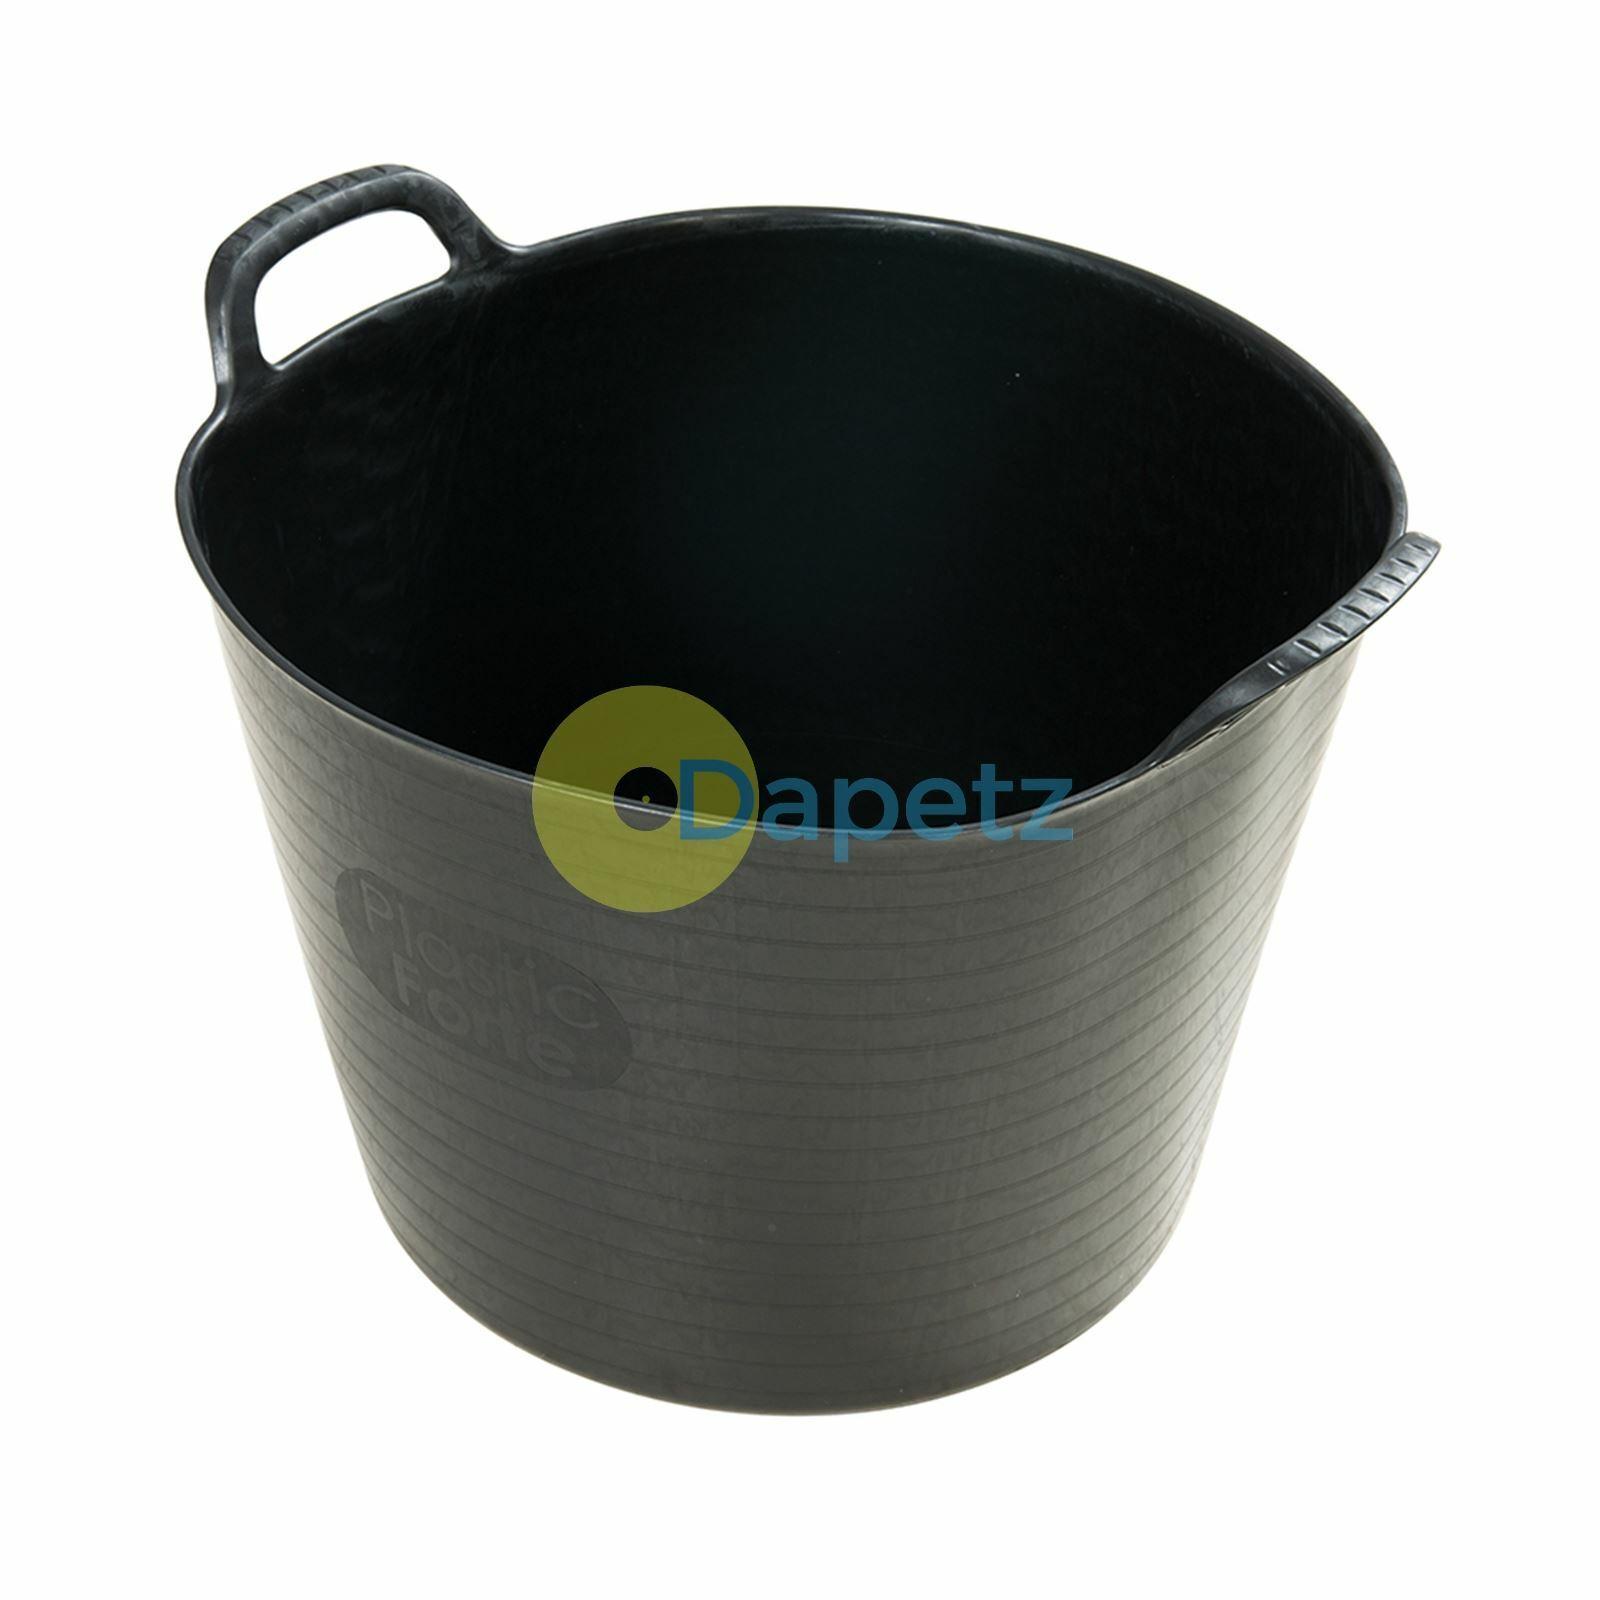 42ltr Grande Flessibile Giardino Tub Trendy Cestino Nero - 10pk